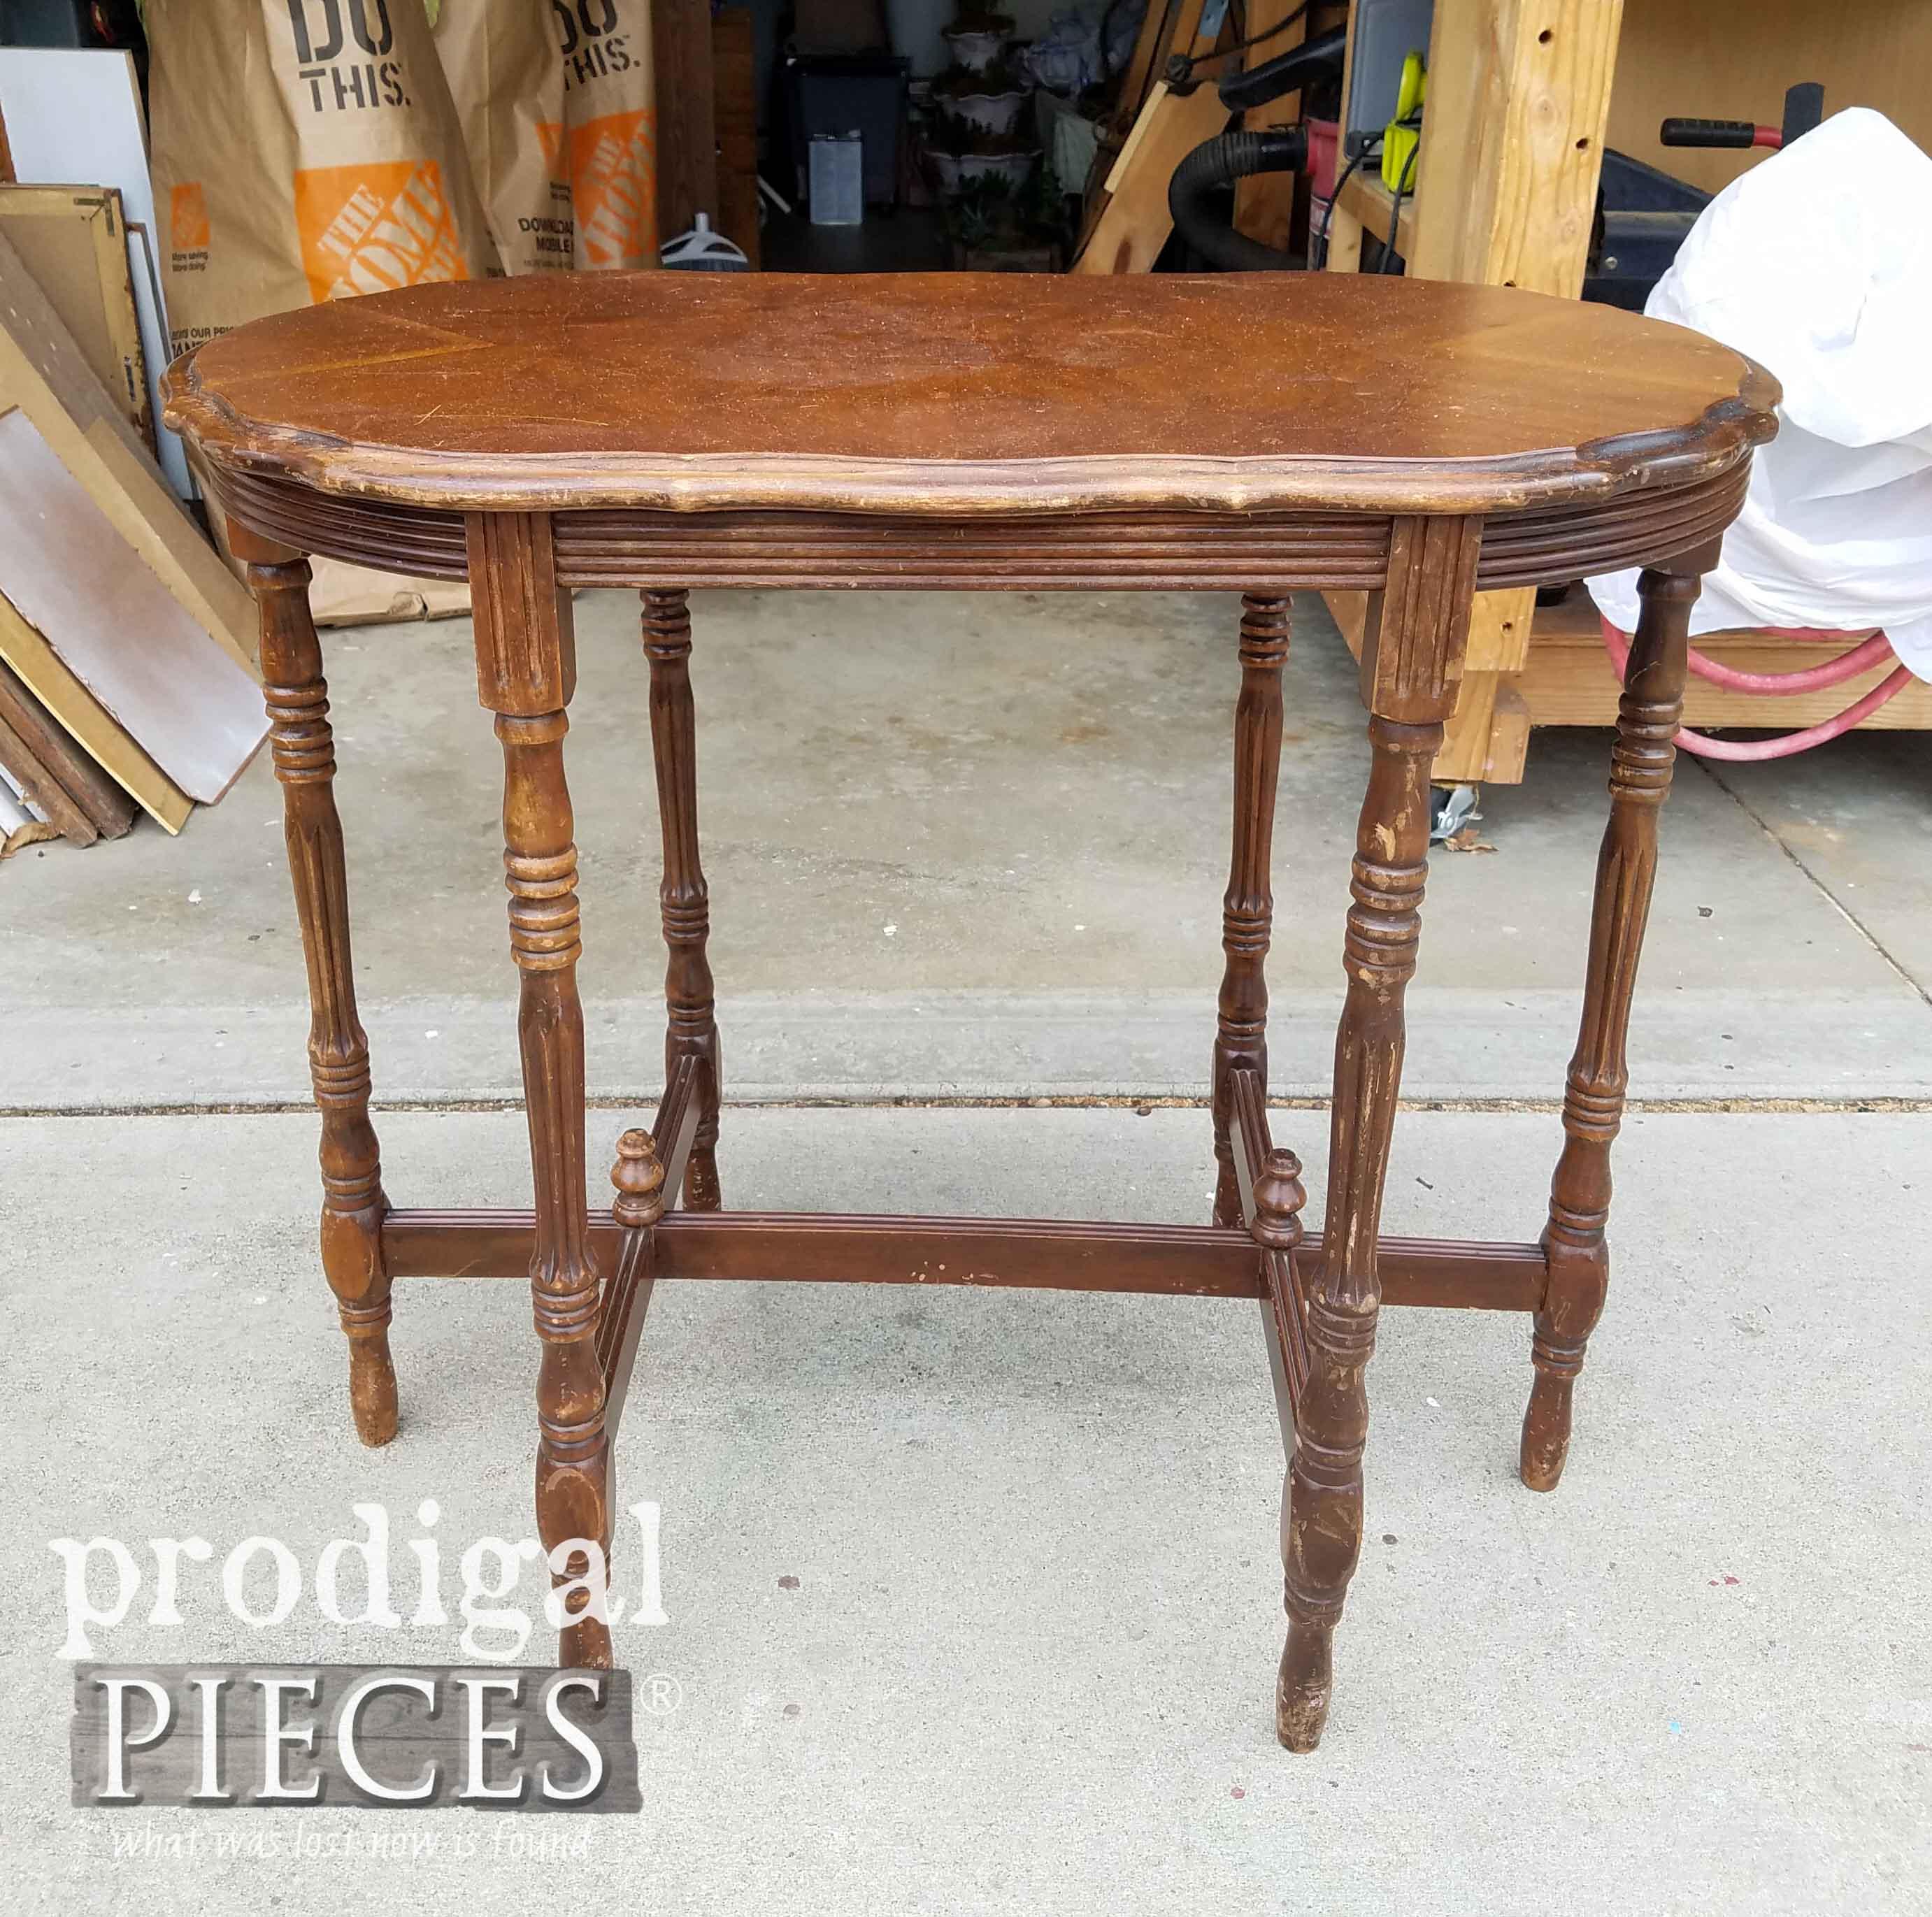 Merveilleux Antique Side Table Before Makeover By Prodigal Pieces | Prodigalpieces.com